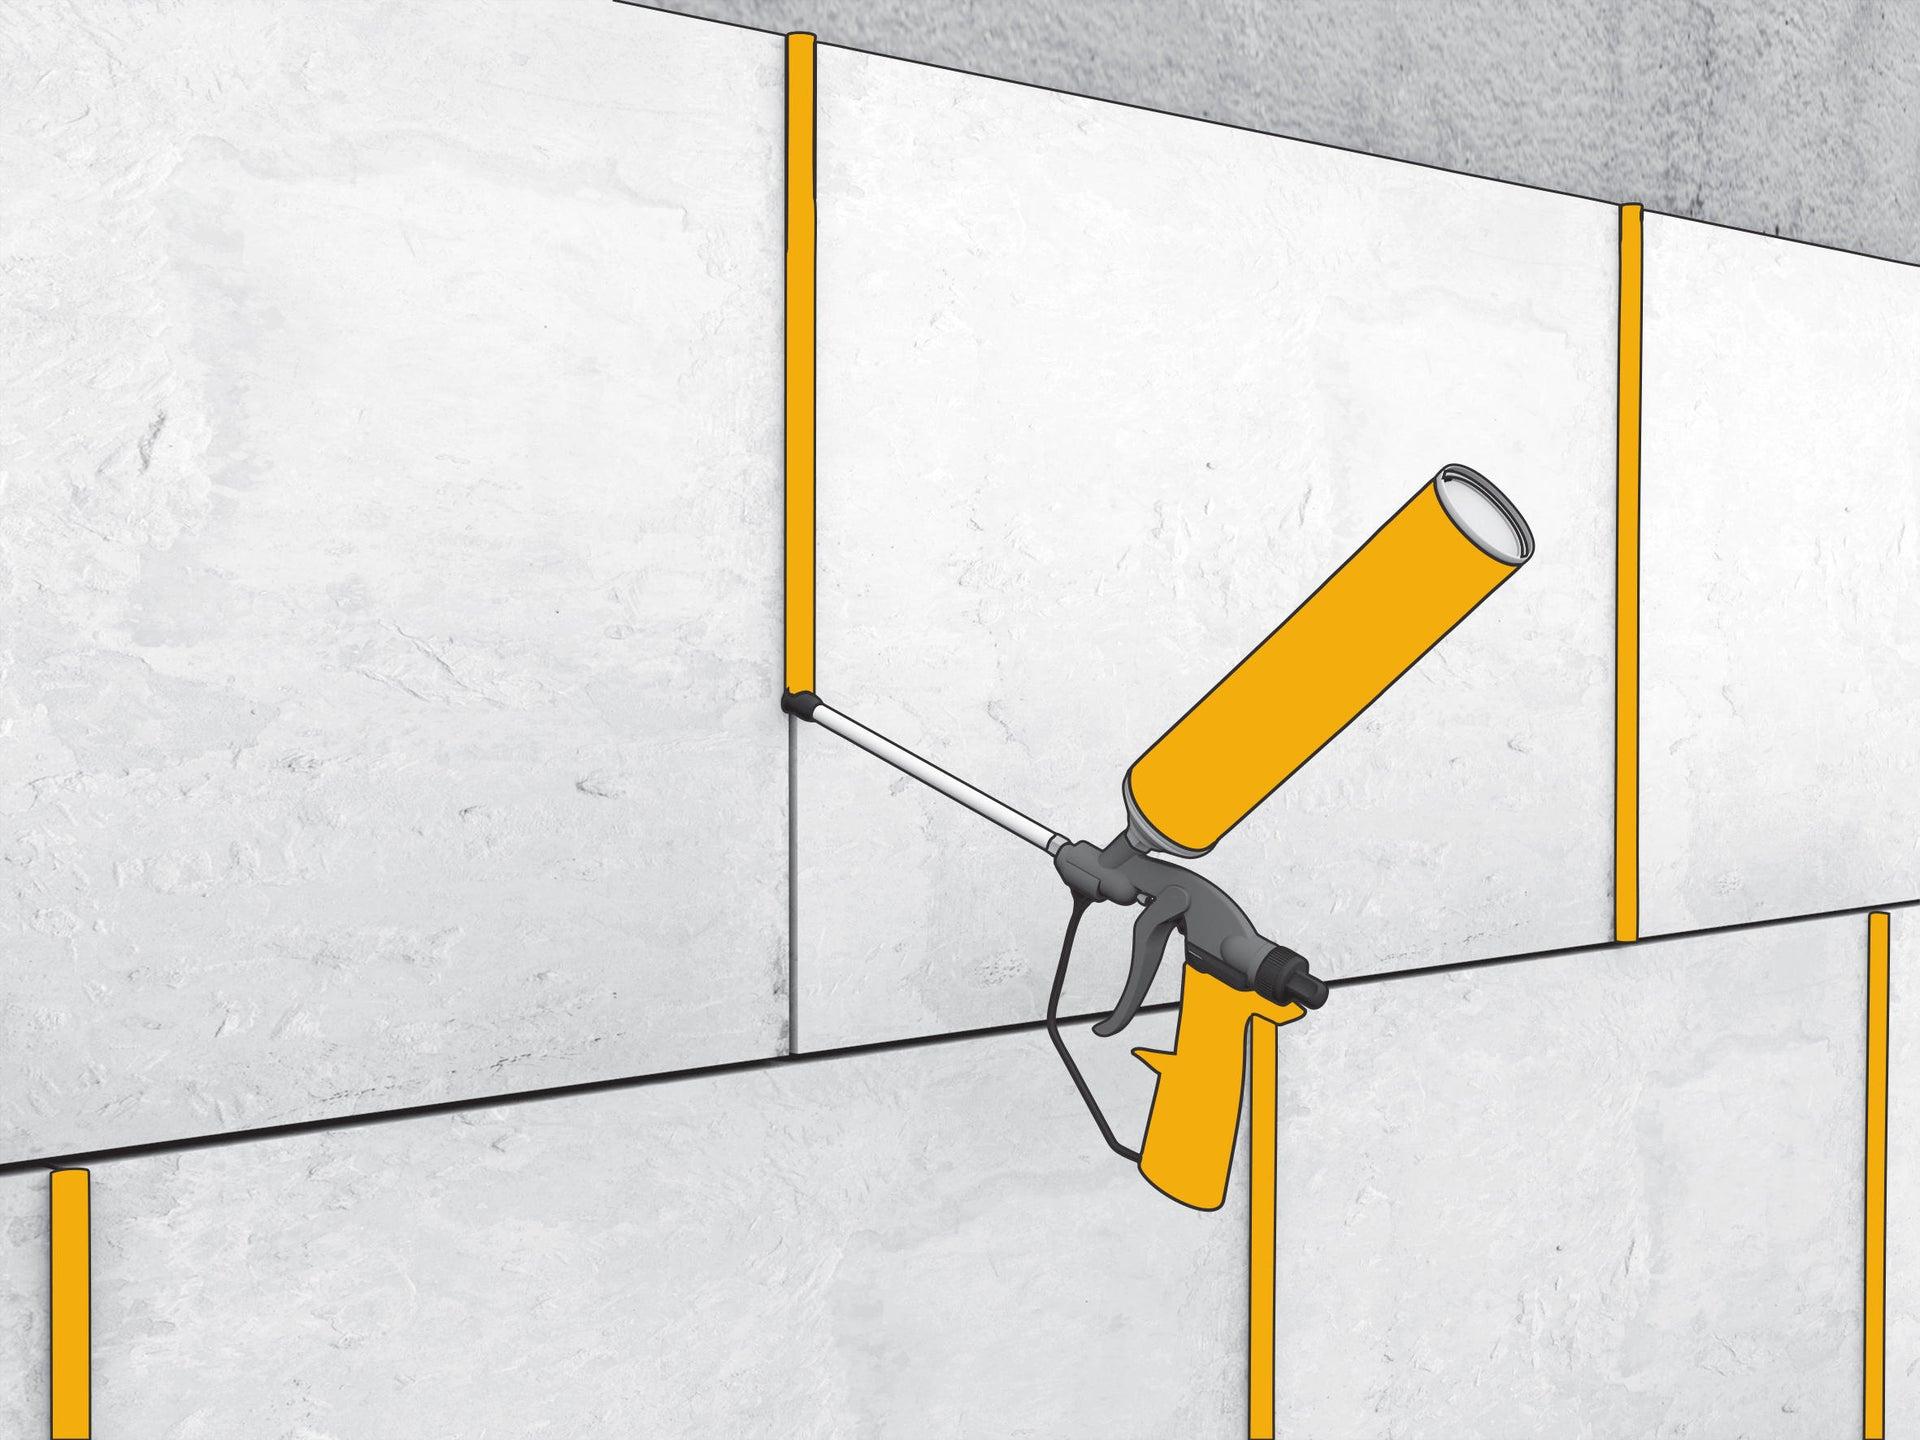 Schiuma poliuretanica SIKA SikaBond FoamFix+ giallo 300 ml - 2